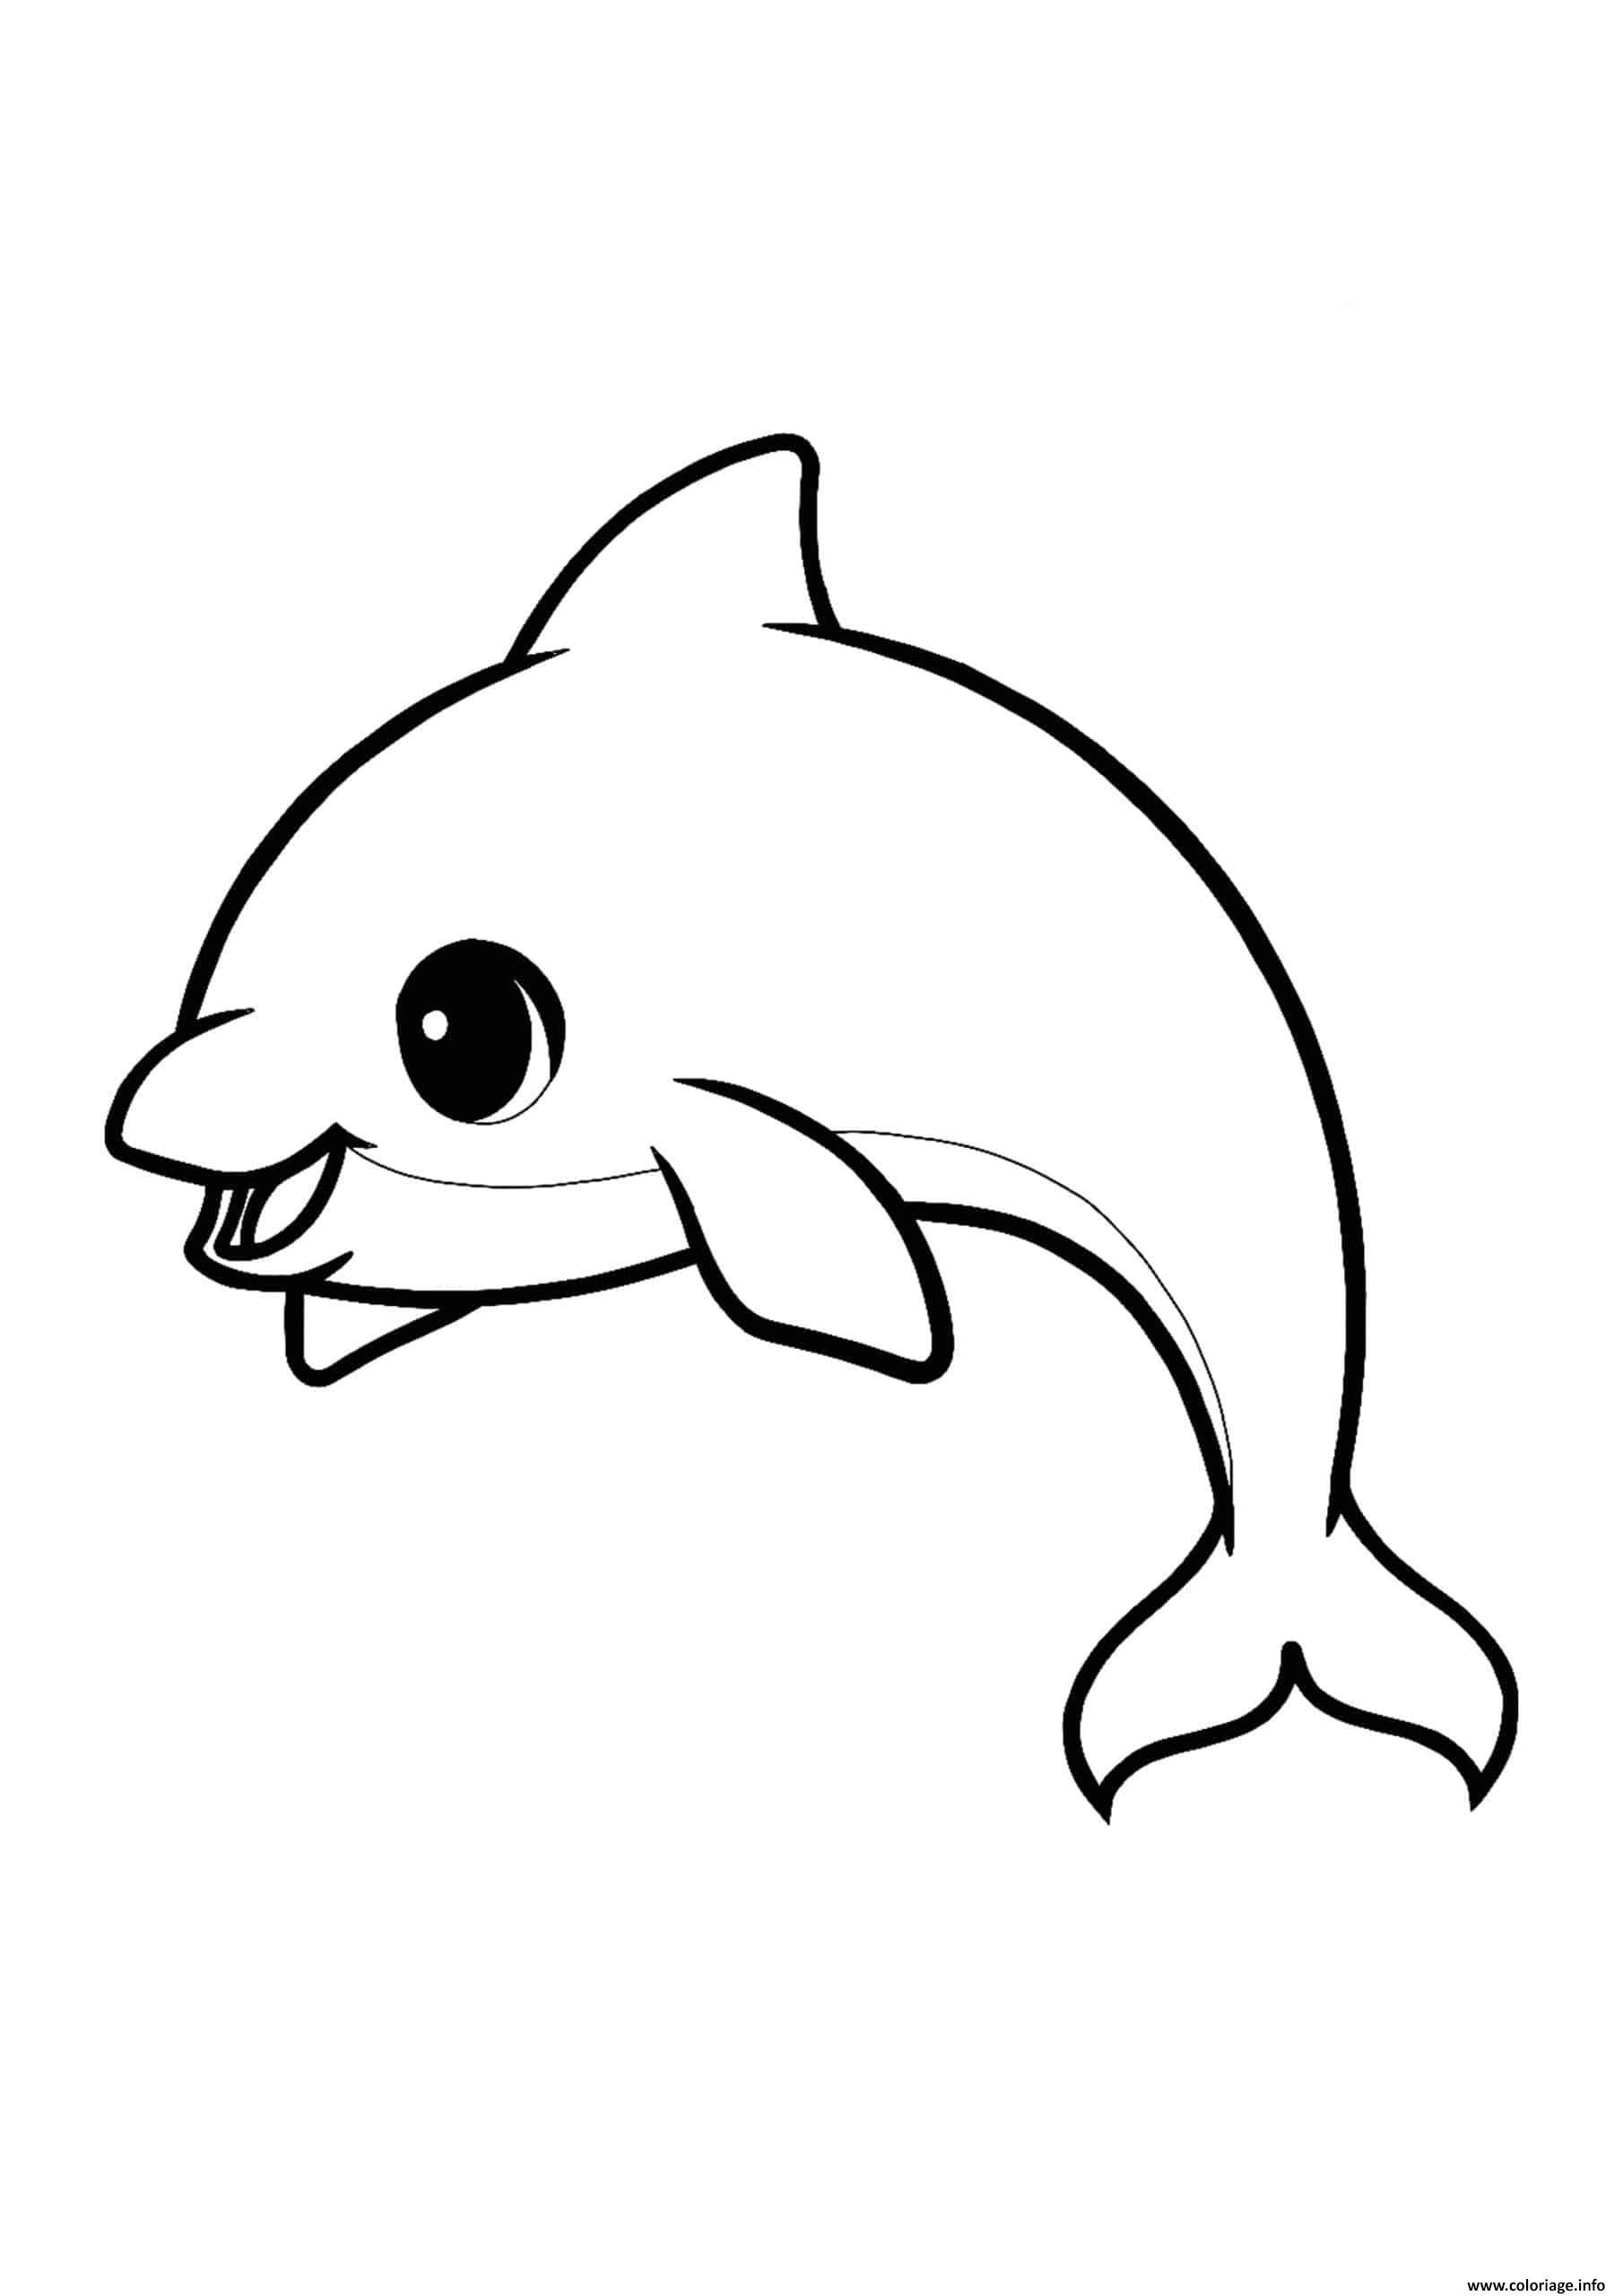 Dessin dauphin kawaii adorable Coloriage Gratuit à Imprimer